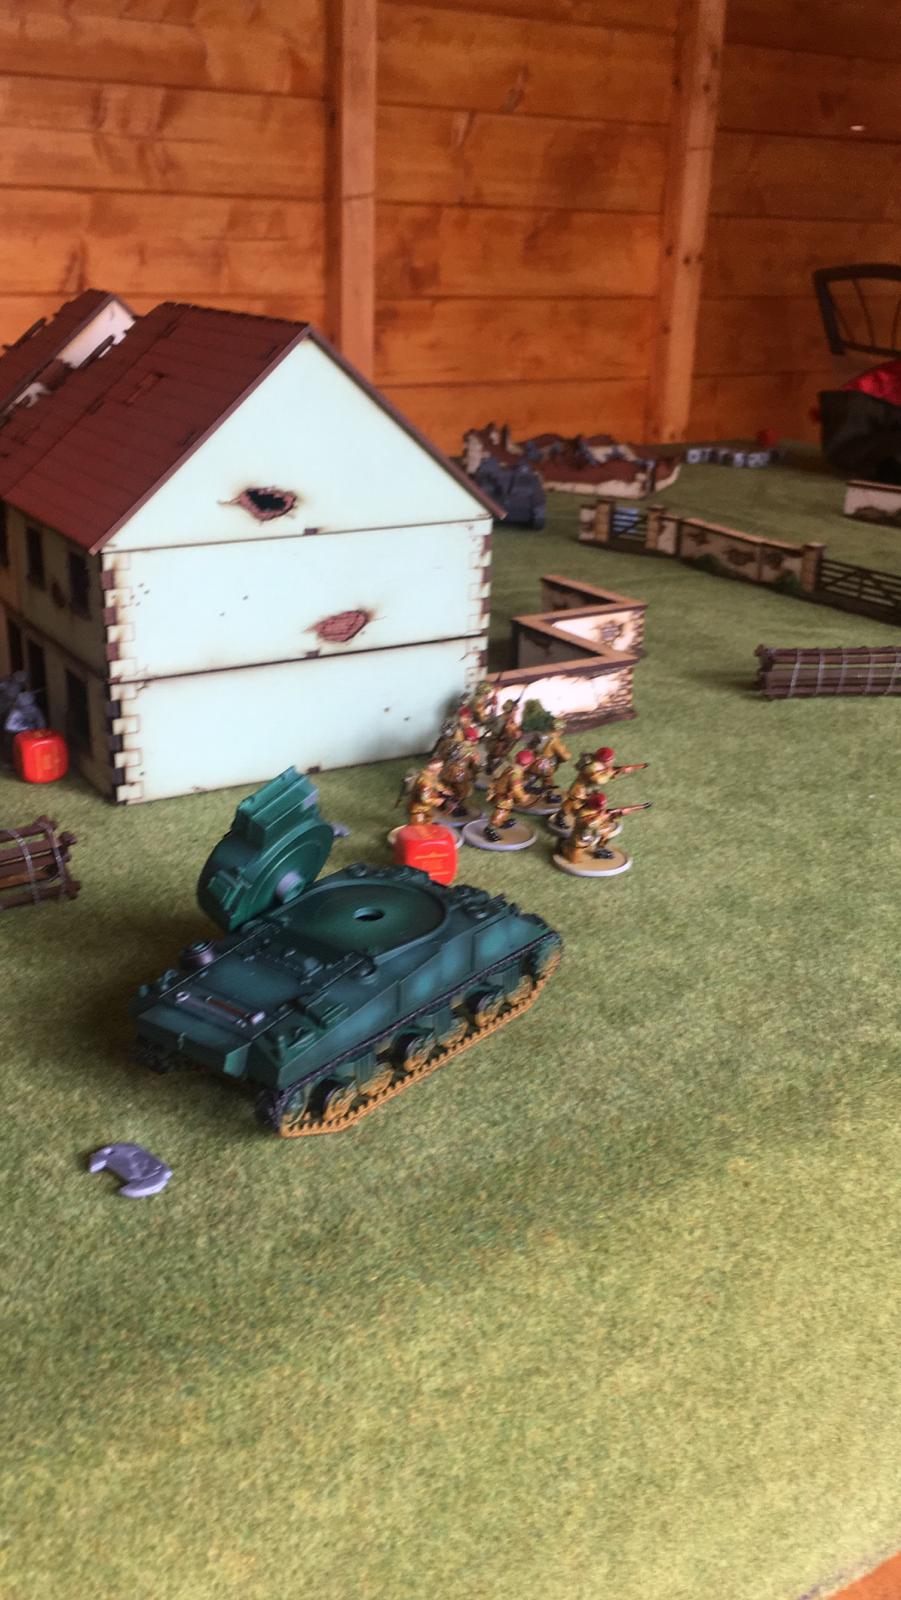 Germans versus Airborne brits in a fierce infantry engagement